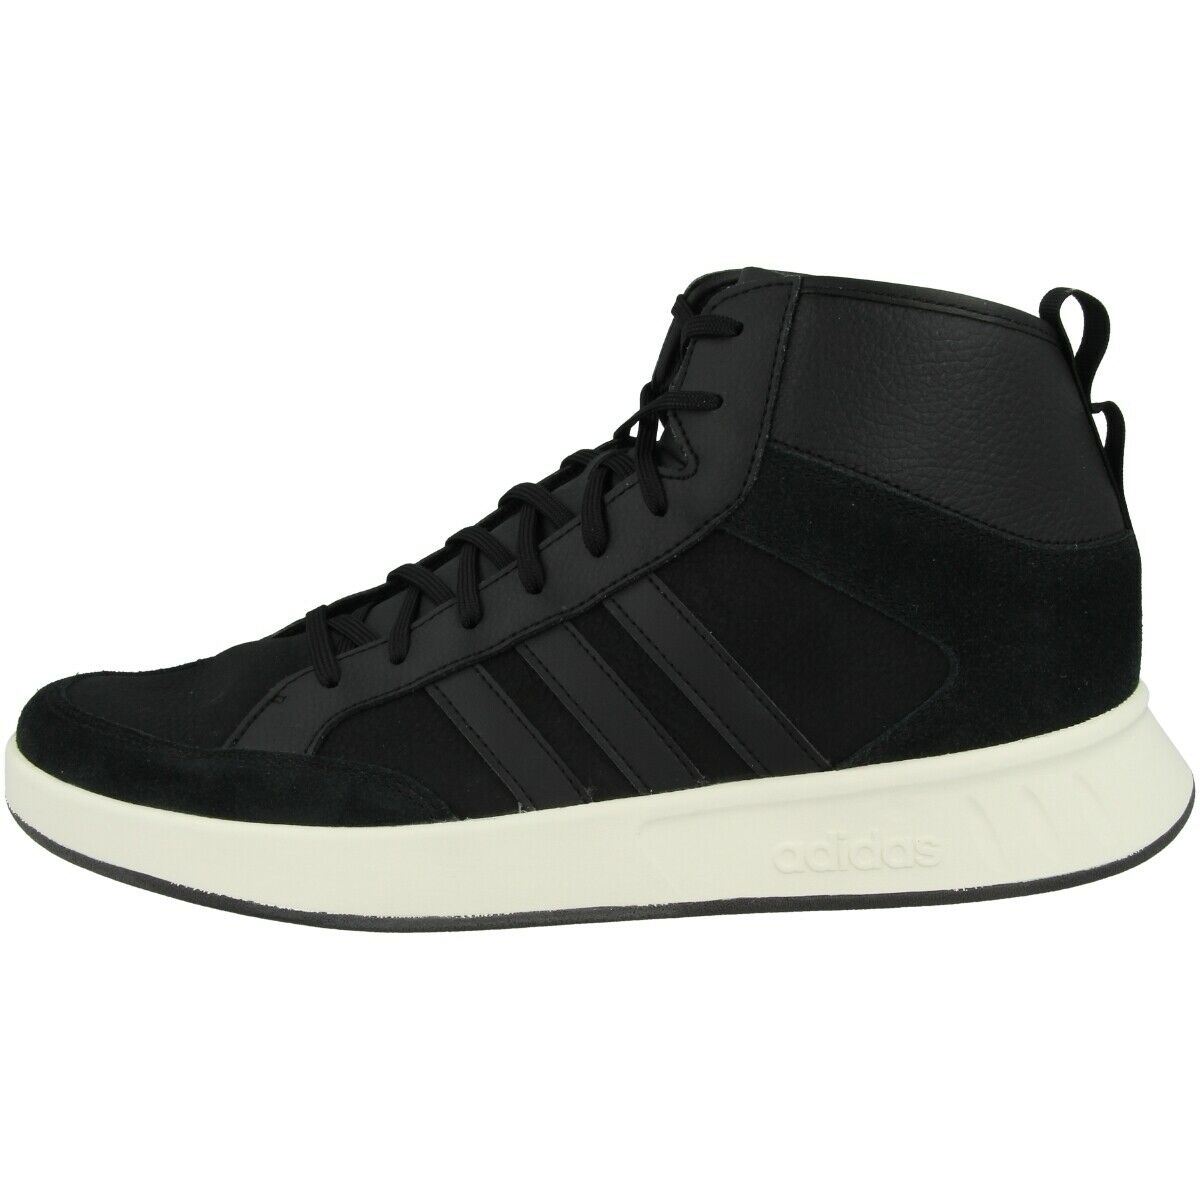 KangaROOS K-Muse Schuhe Sport Freizeit Sneaker Turnschuhe black olive 18284-5031